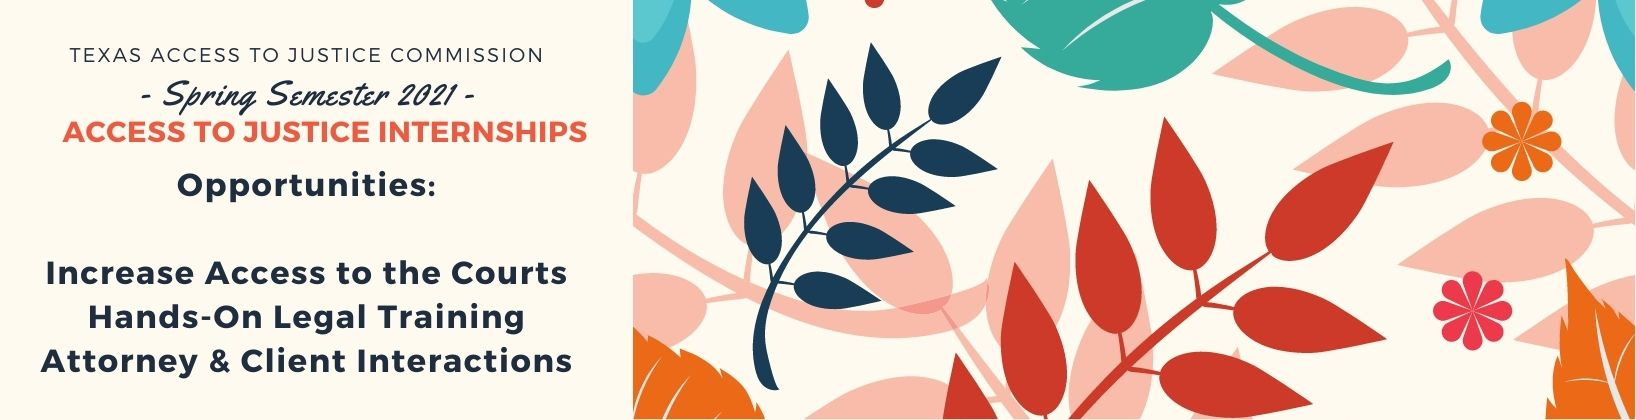 Spring 2021 Floral Motif Access to Justice Internship Program